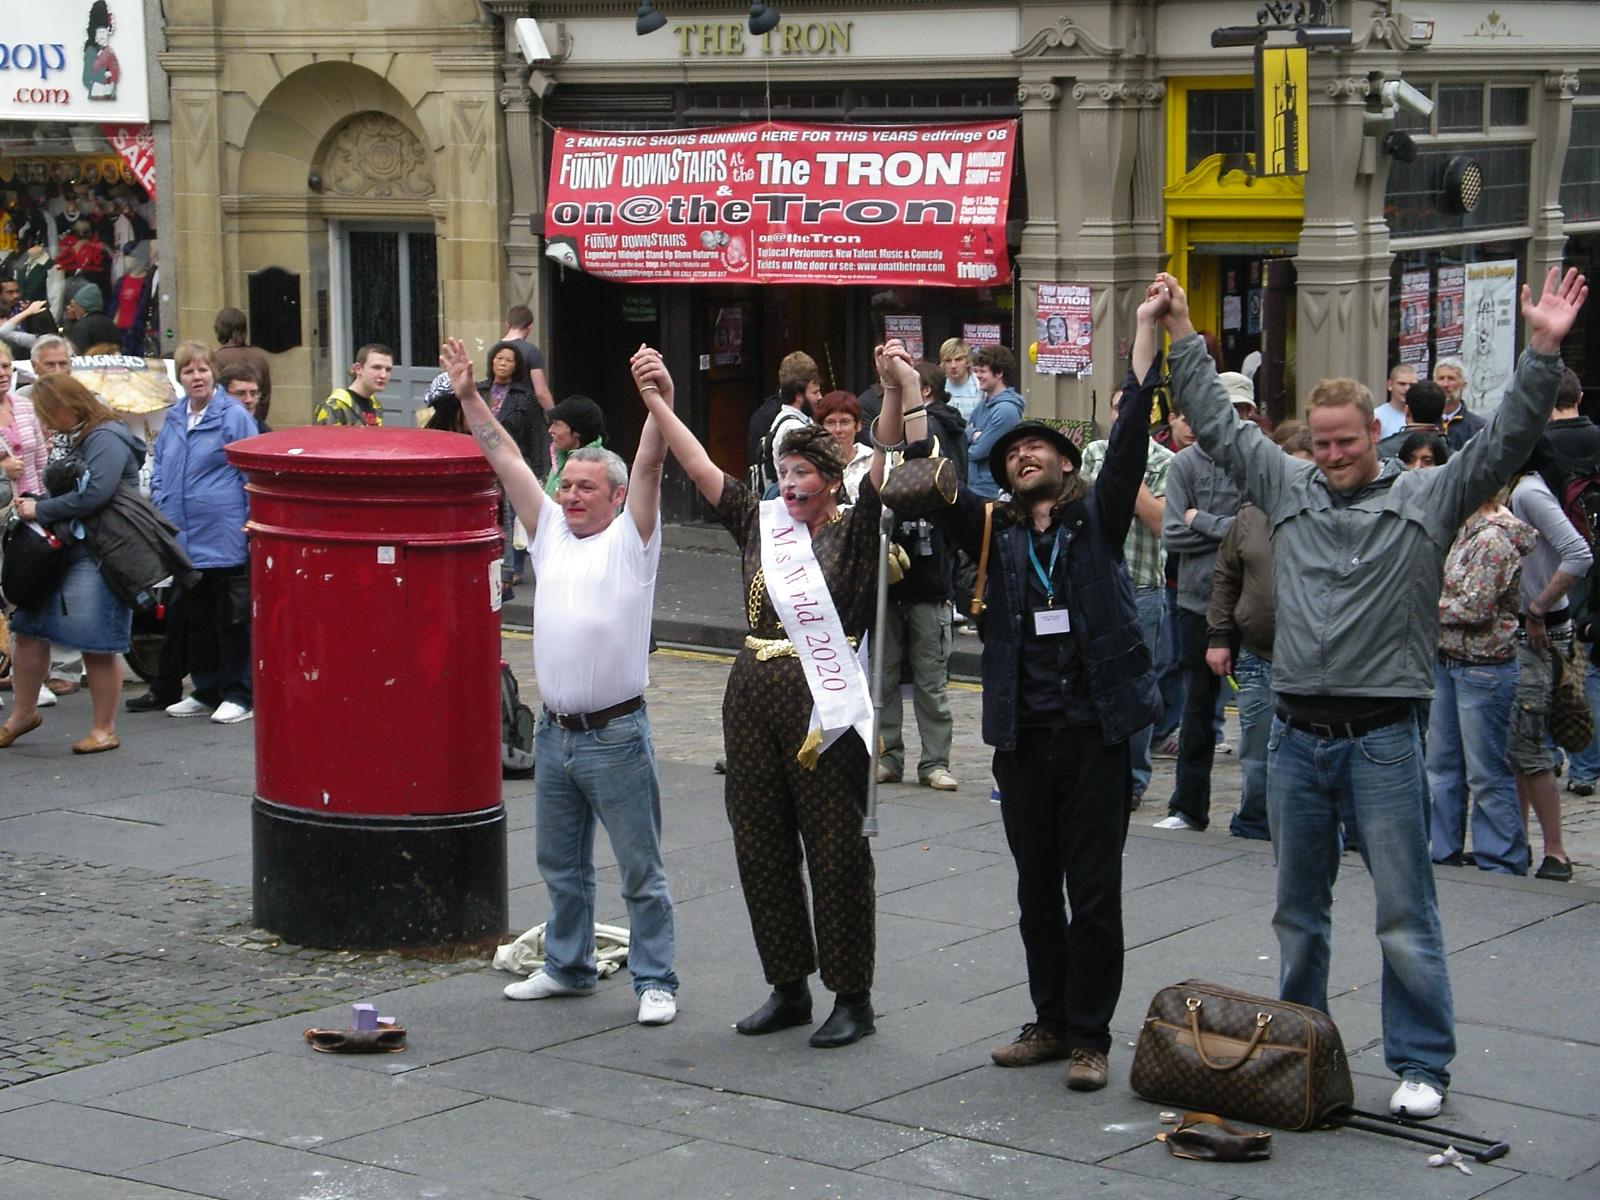 Comedy player and her volunteers, Edinburgh, in Fringe Festival